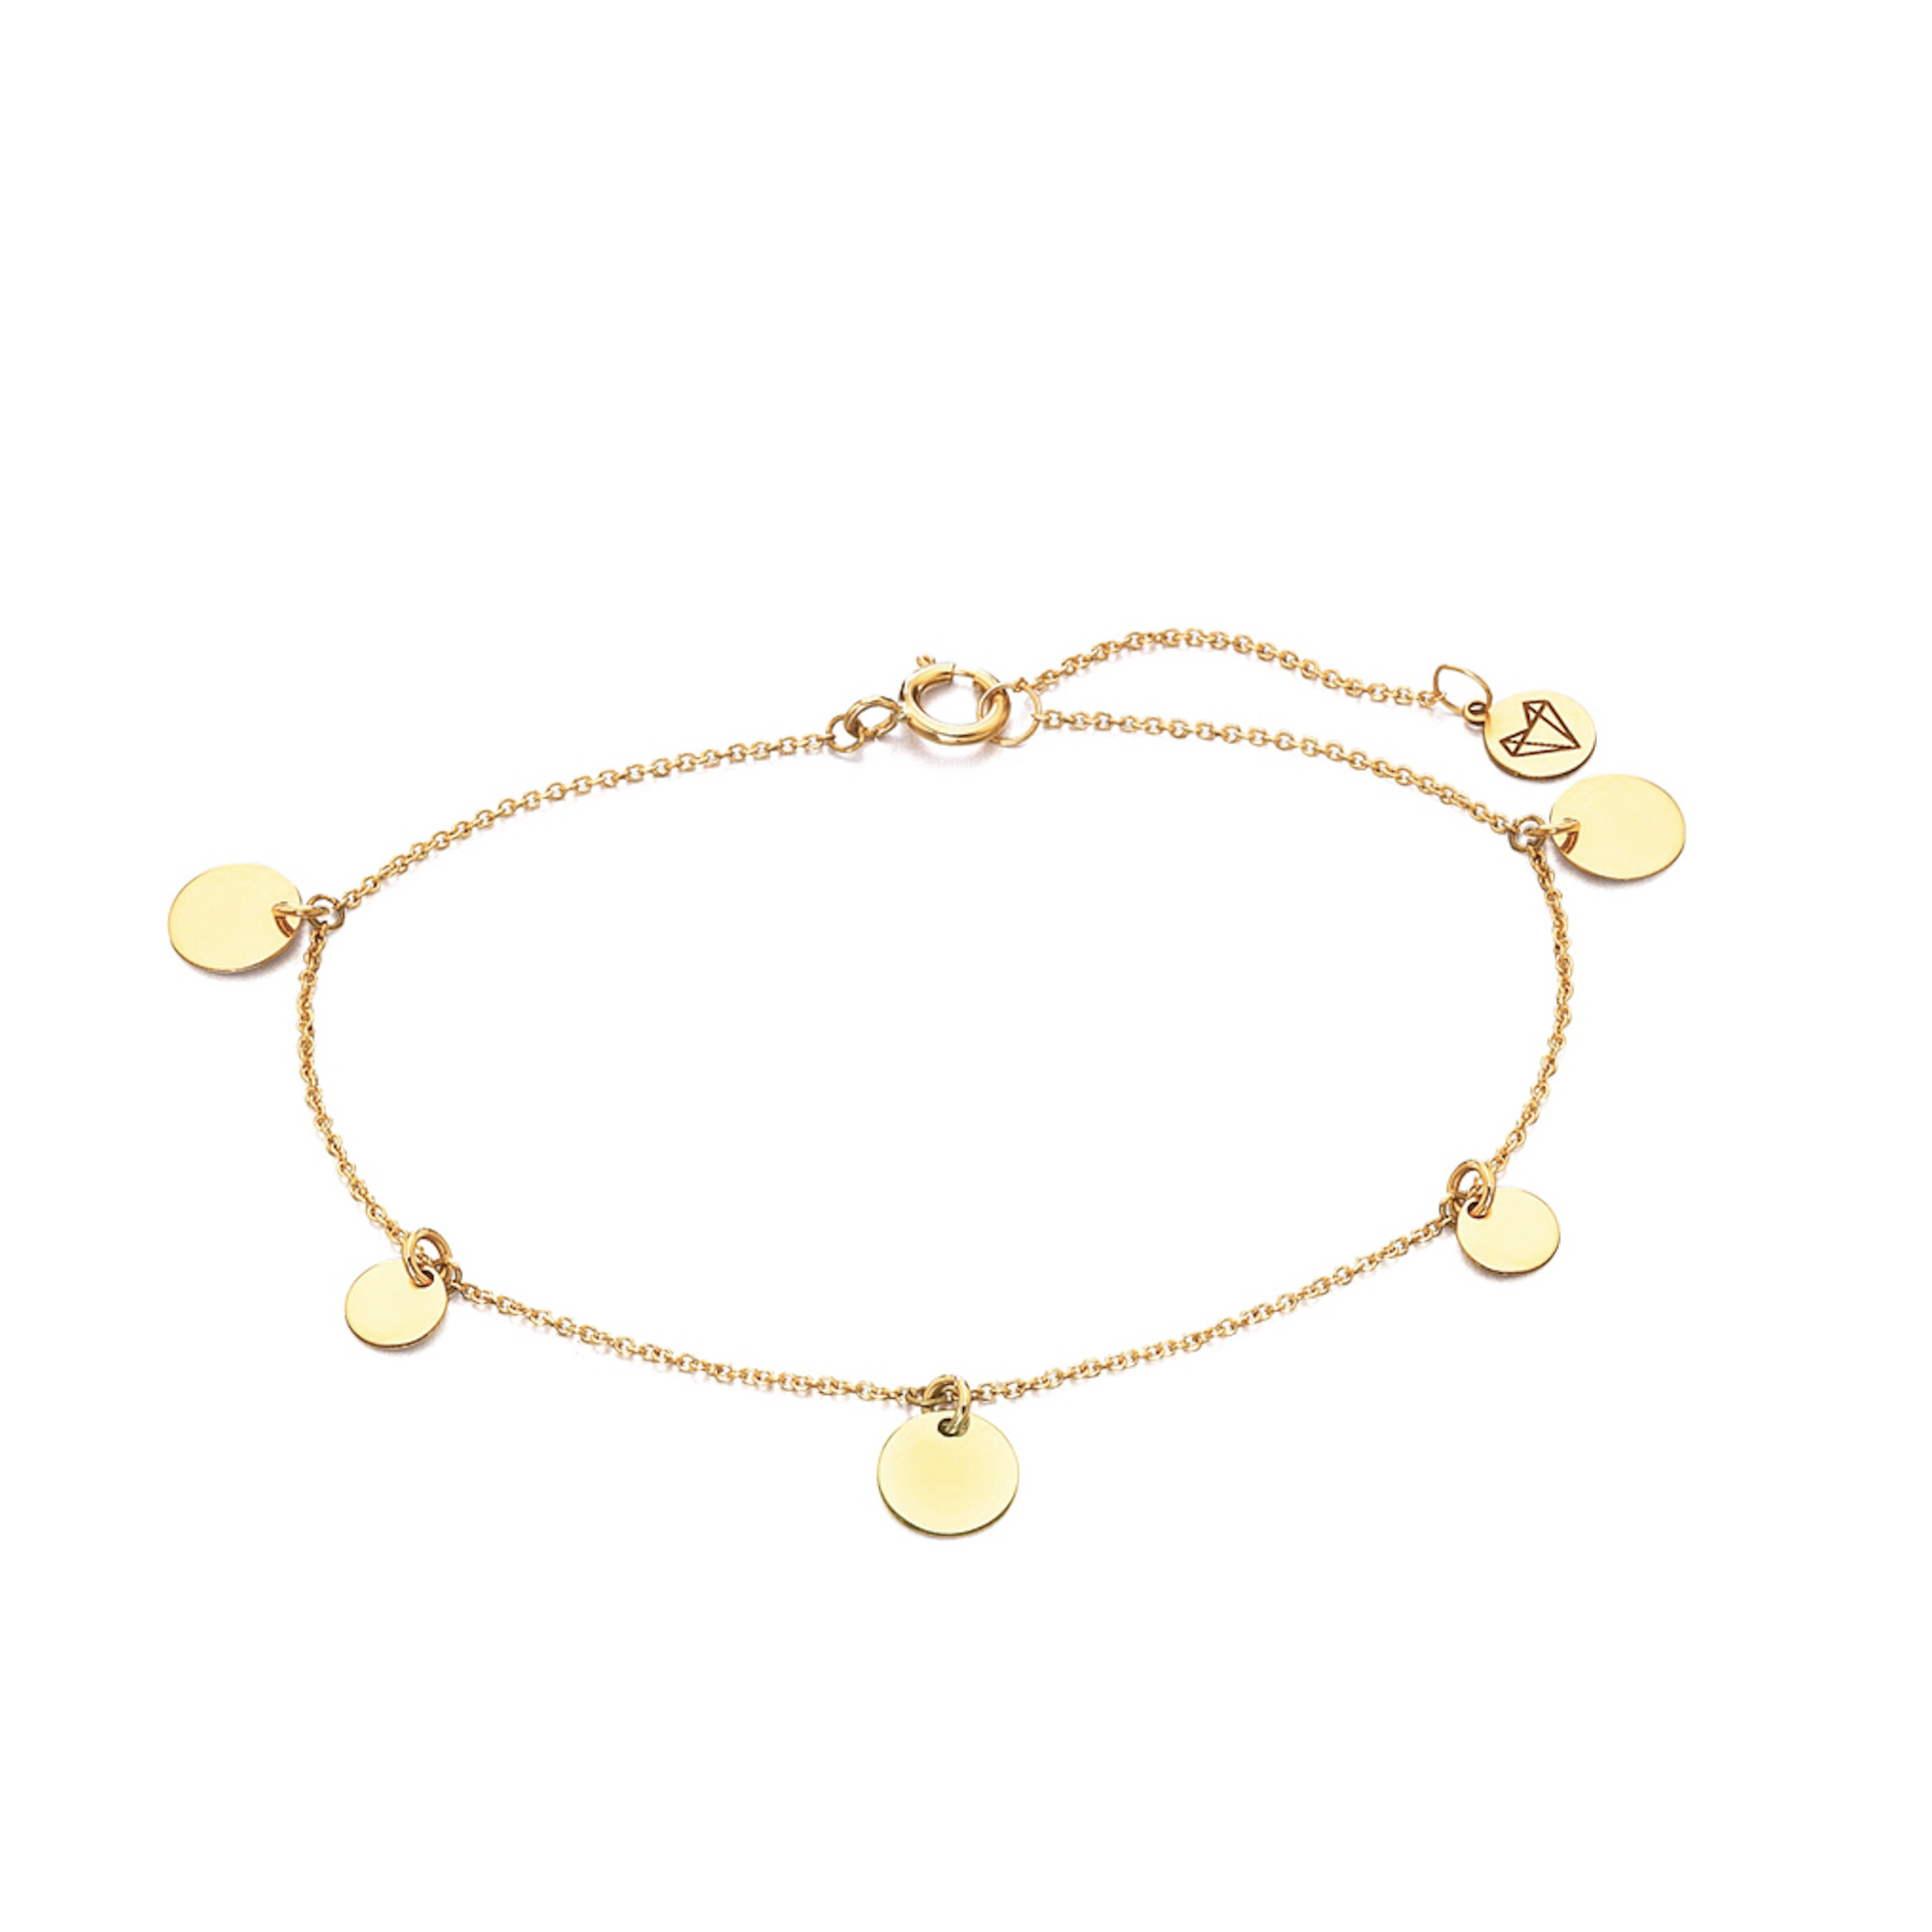 LE CARRÈ bracciale oro giallo 5 dischi bracelet discount sconto